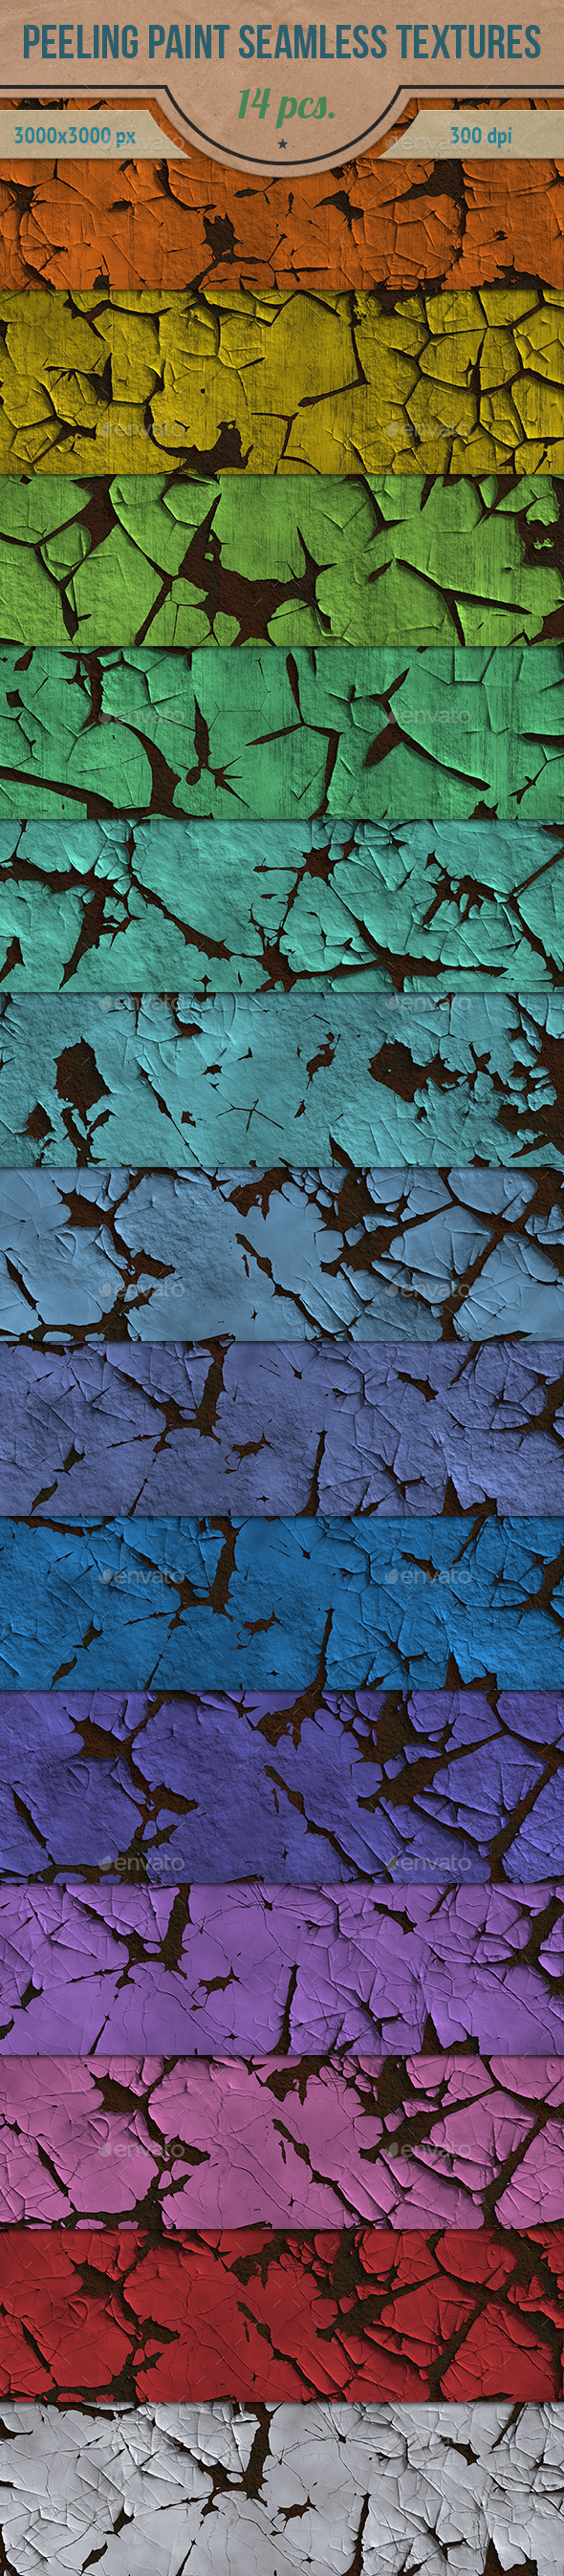 Peeling Paint HD Seamless Textures Pack - Industrial / Grunge Textures